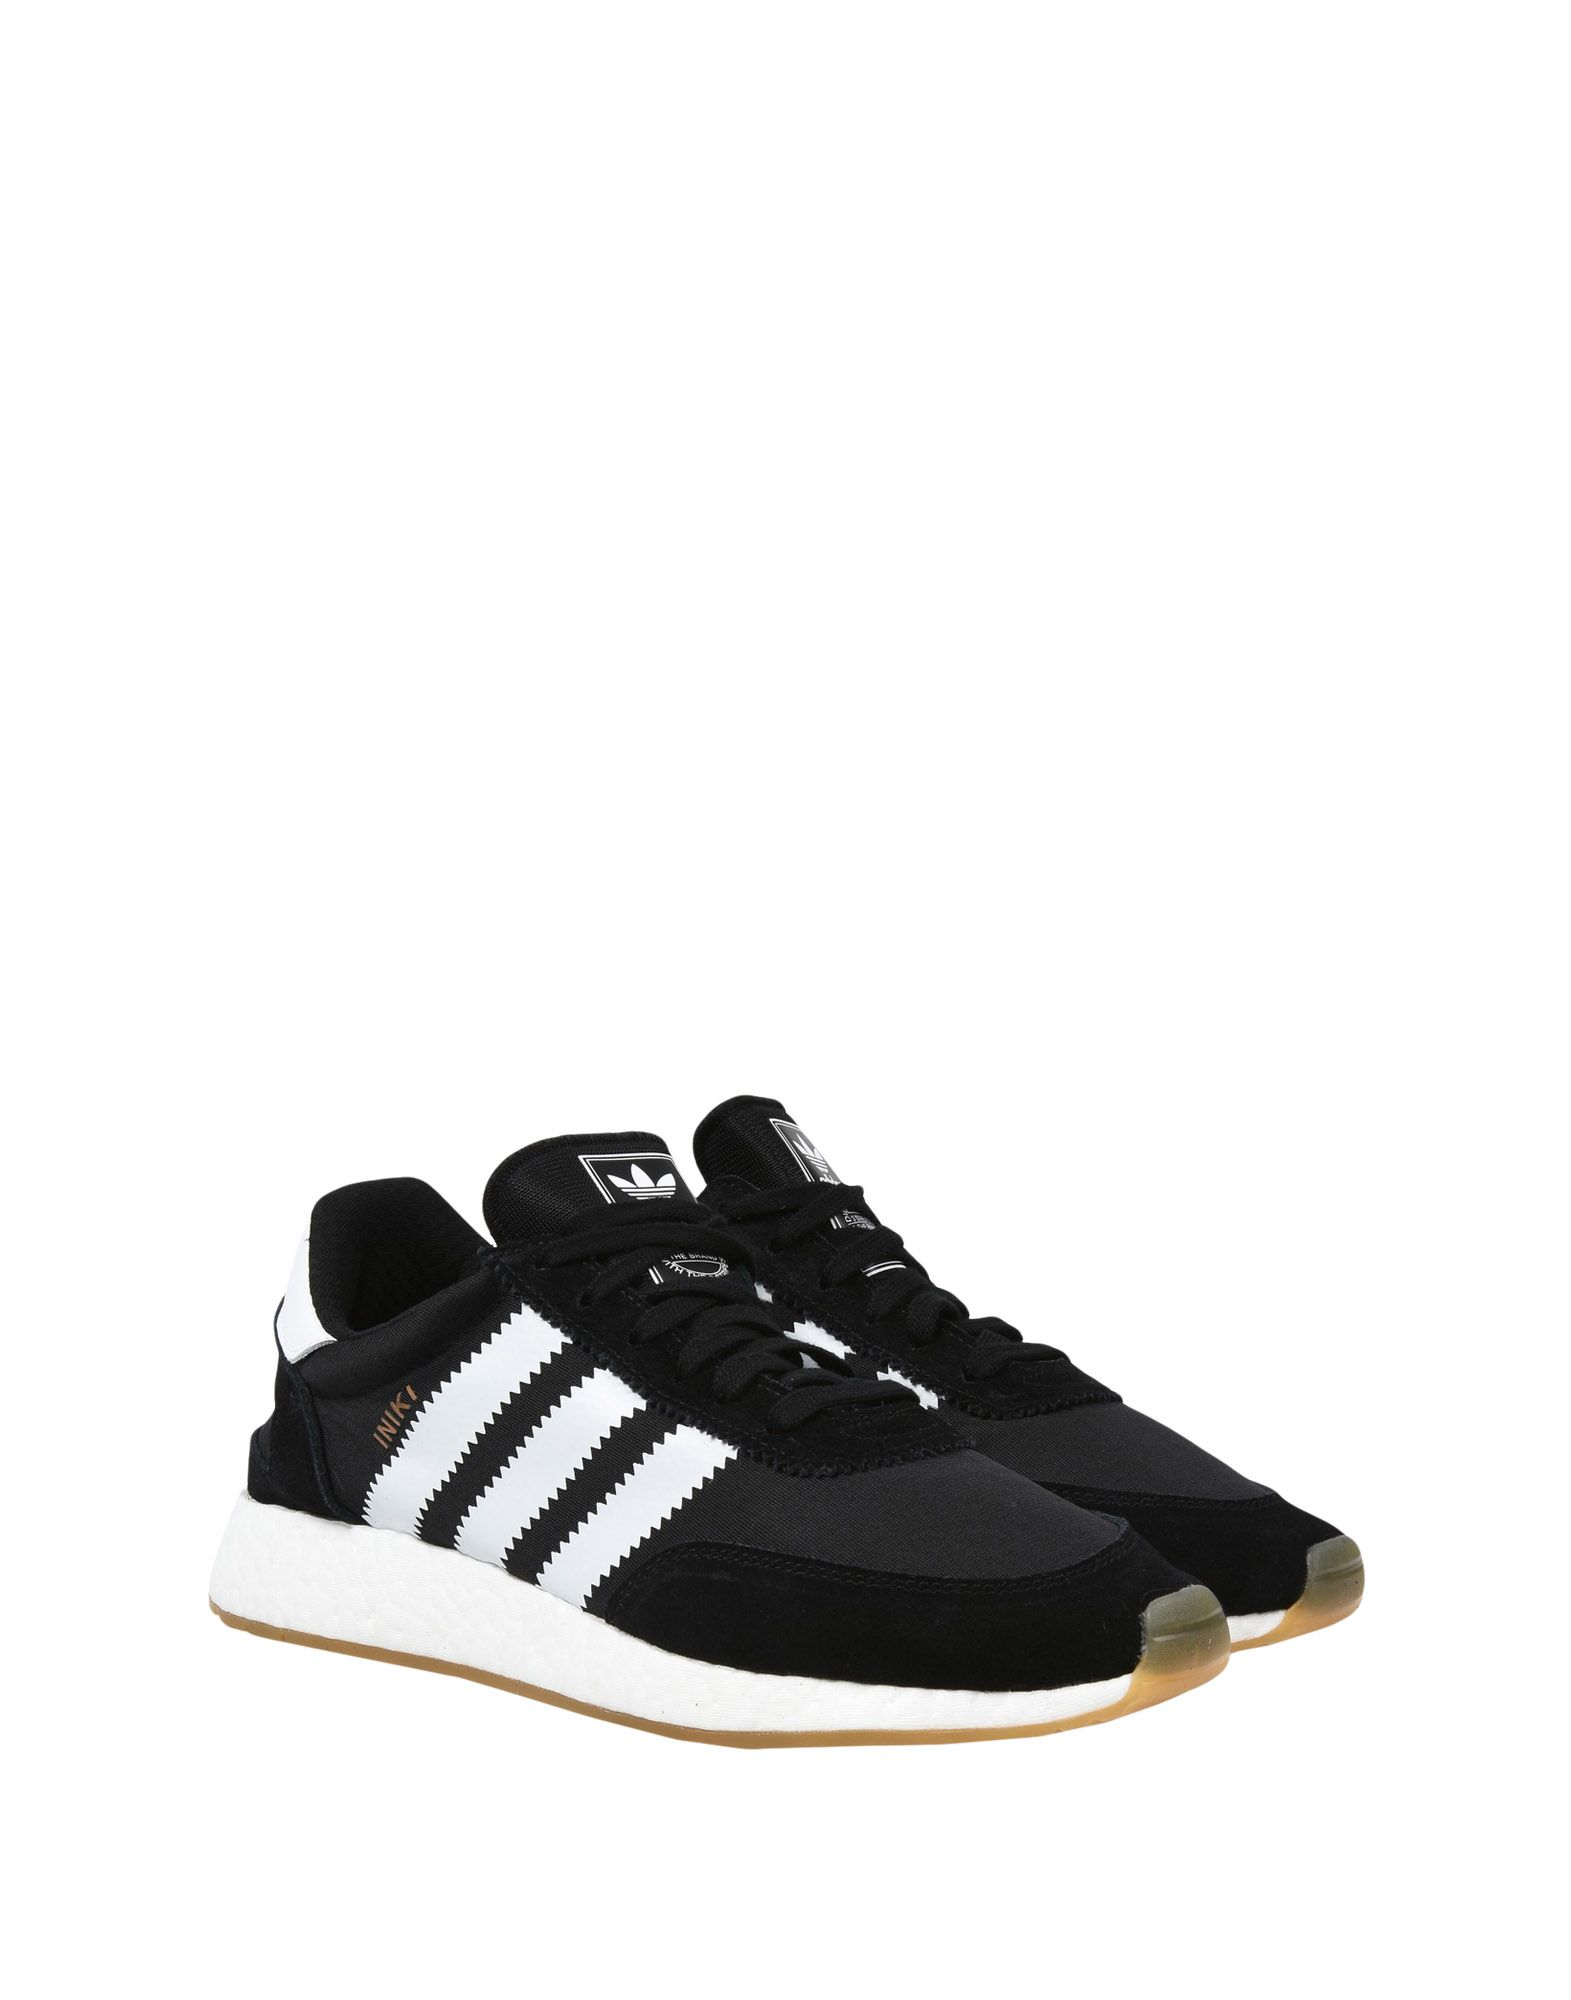 Rabatt Schuhe echte Schuhe Rabatt Adidas Originals I 11316758LP 4bae56